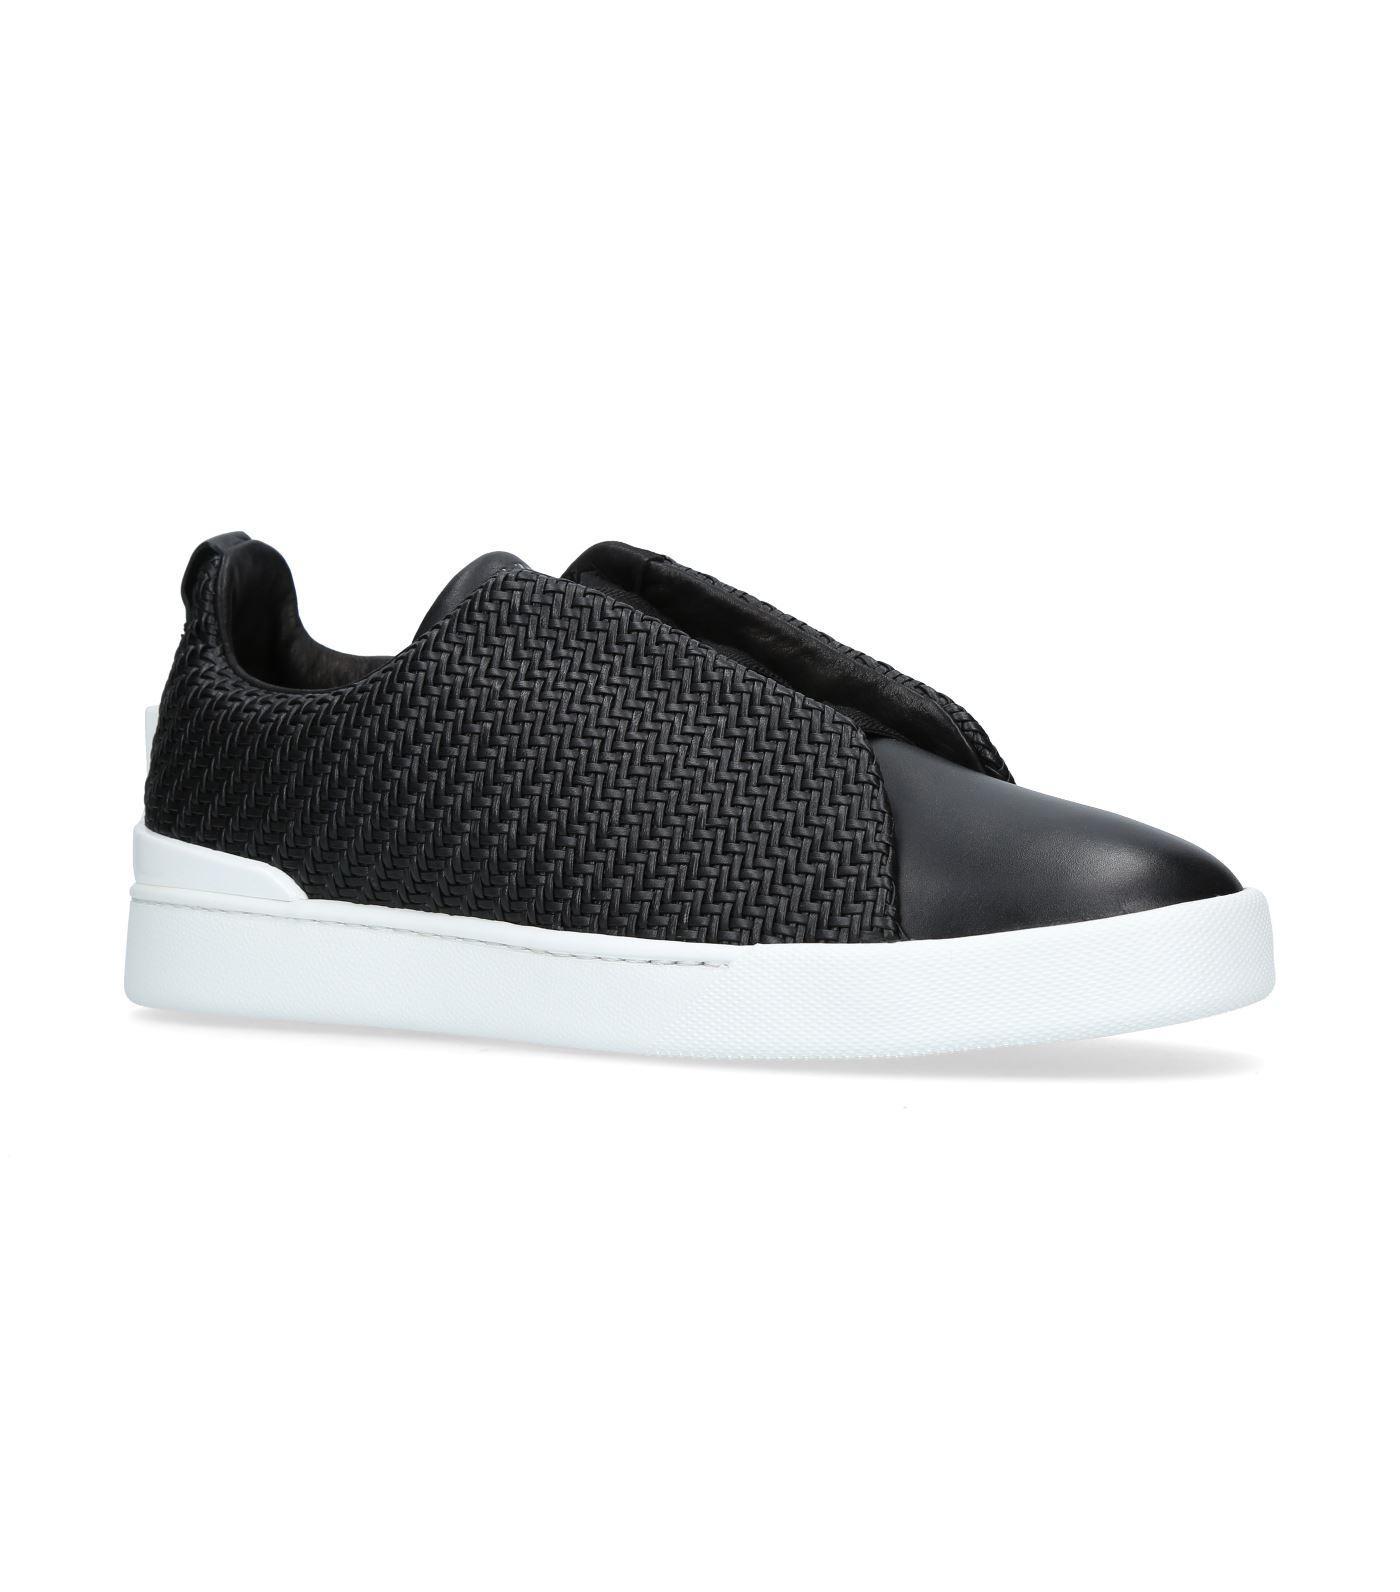 Ermenegildo Zegna Couture 3x Skater Shoes In Black